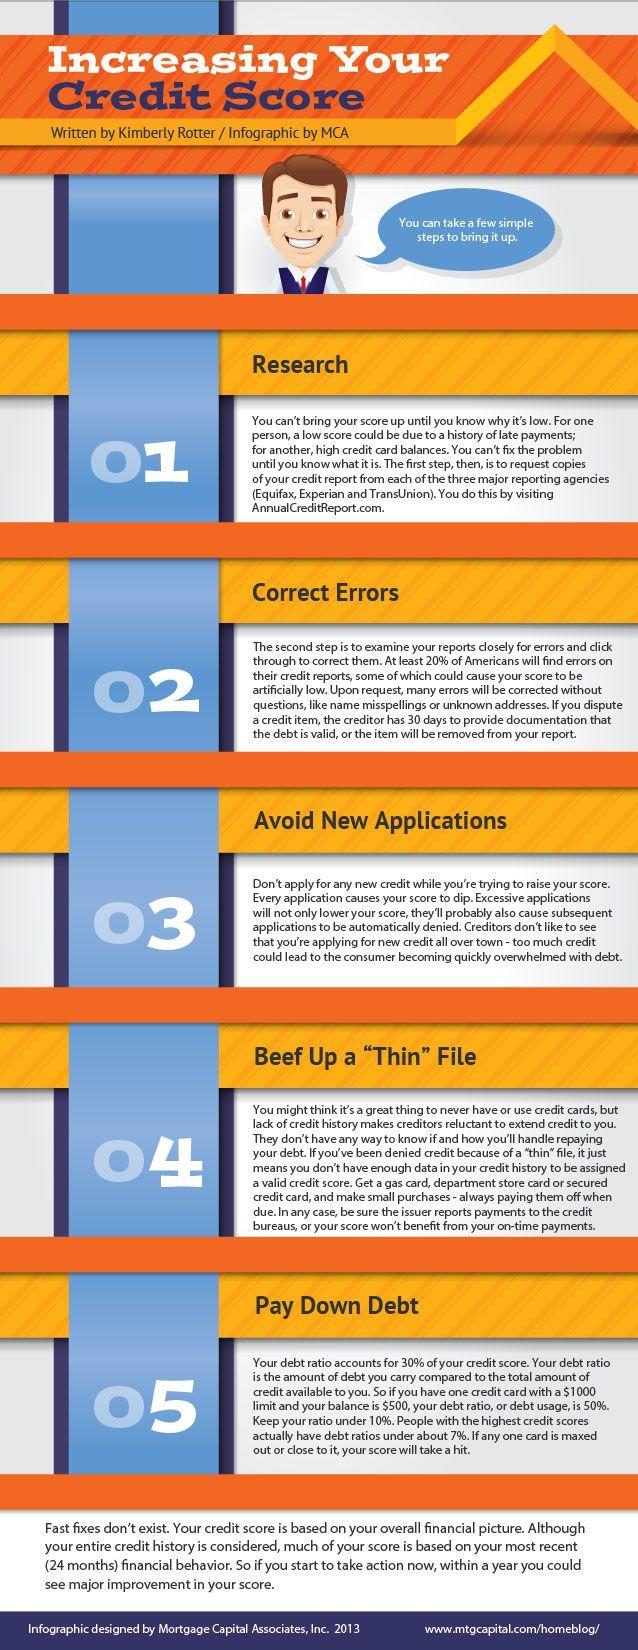 Best 25+ Fixing Credit Score Ideas On Pinterest  Improve Credit Score,  Credit Card Pin And Credit Score